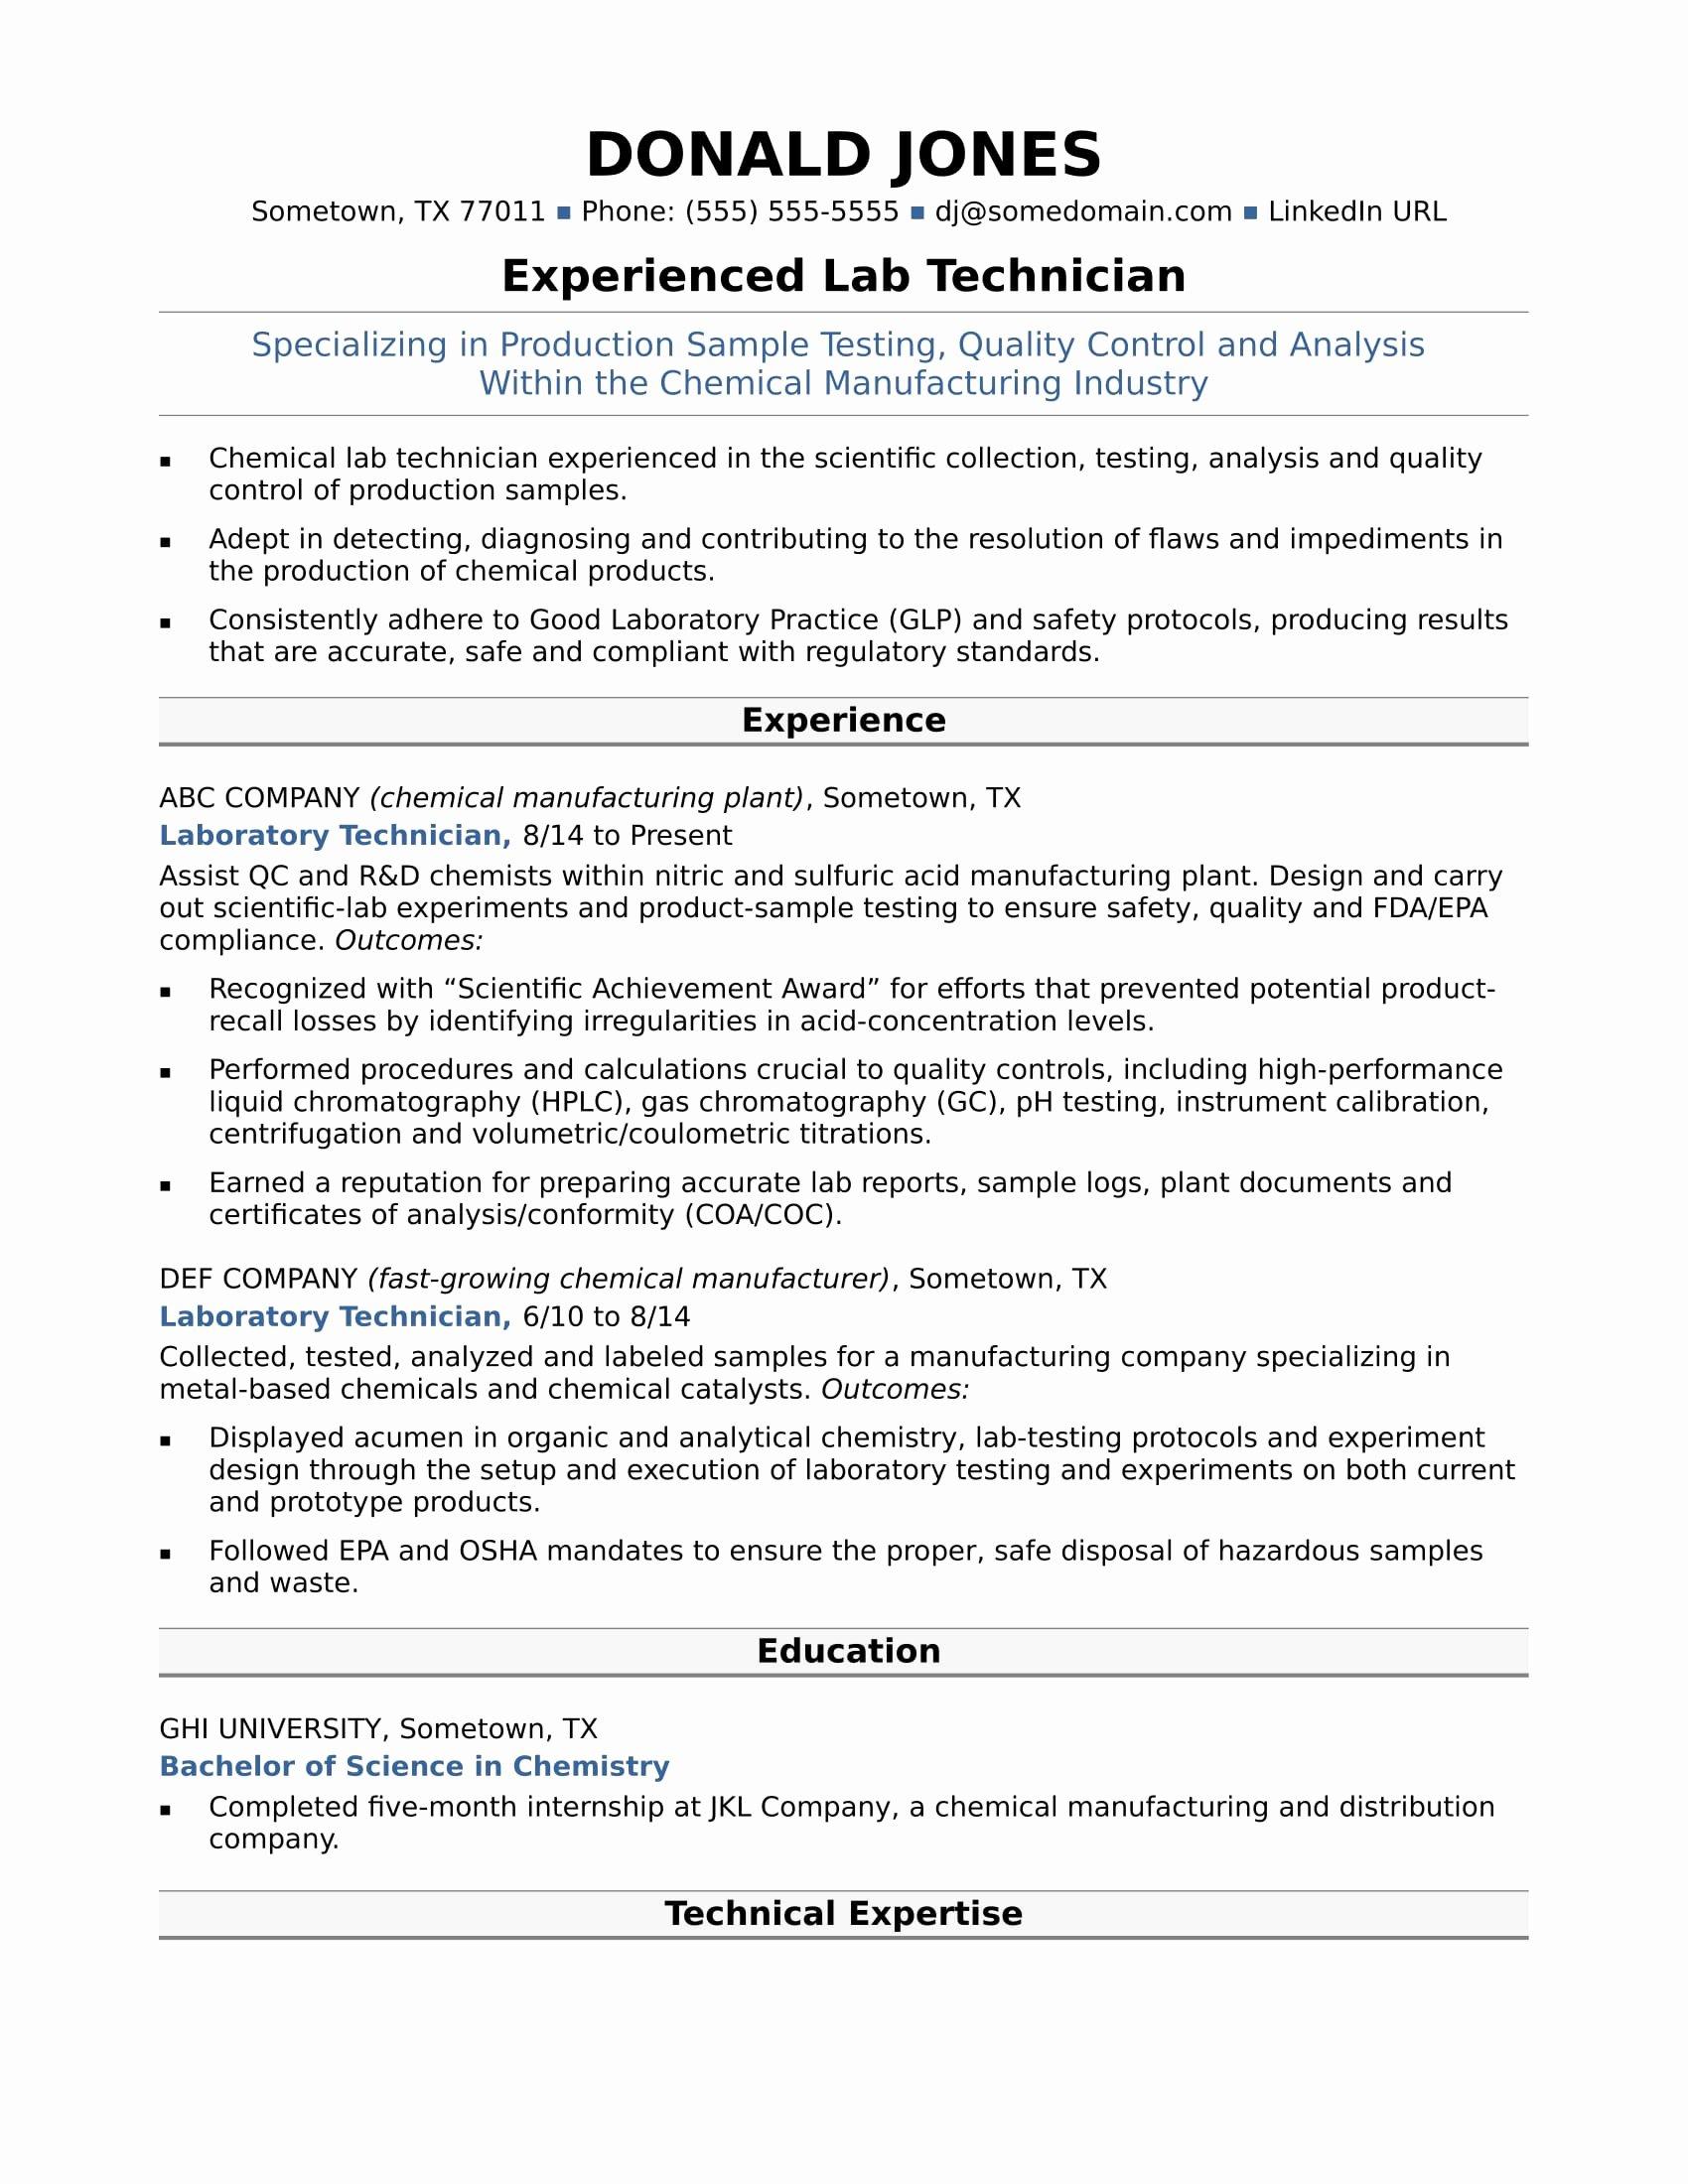 Midlevel Lab Technician Resume Sample